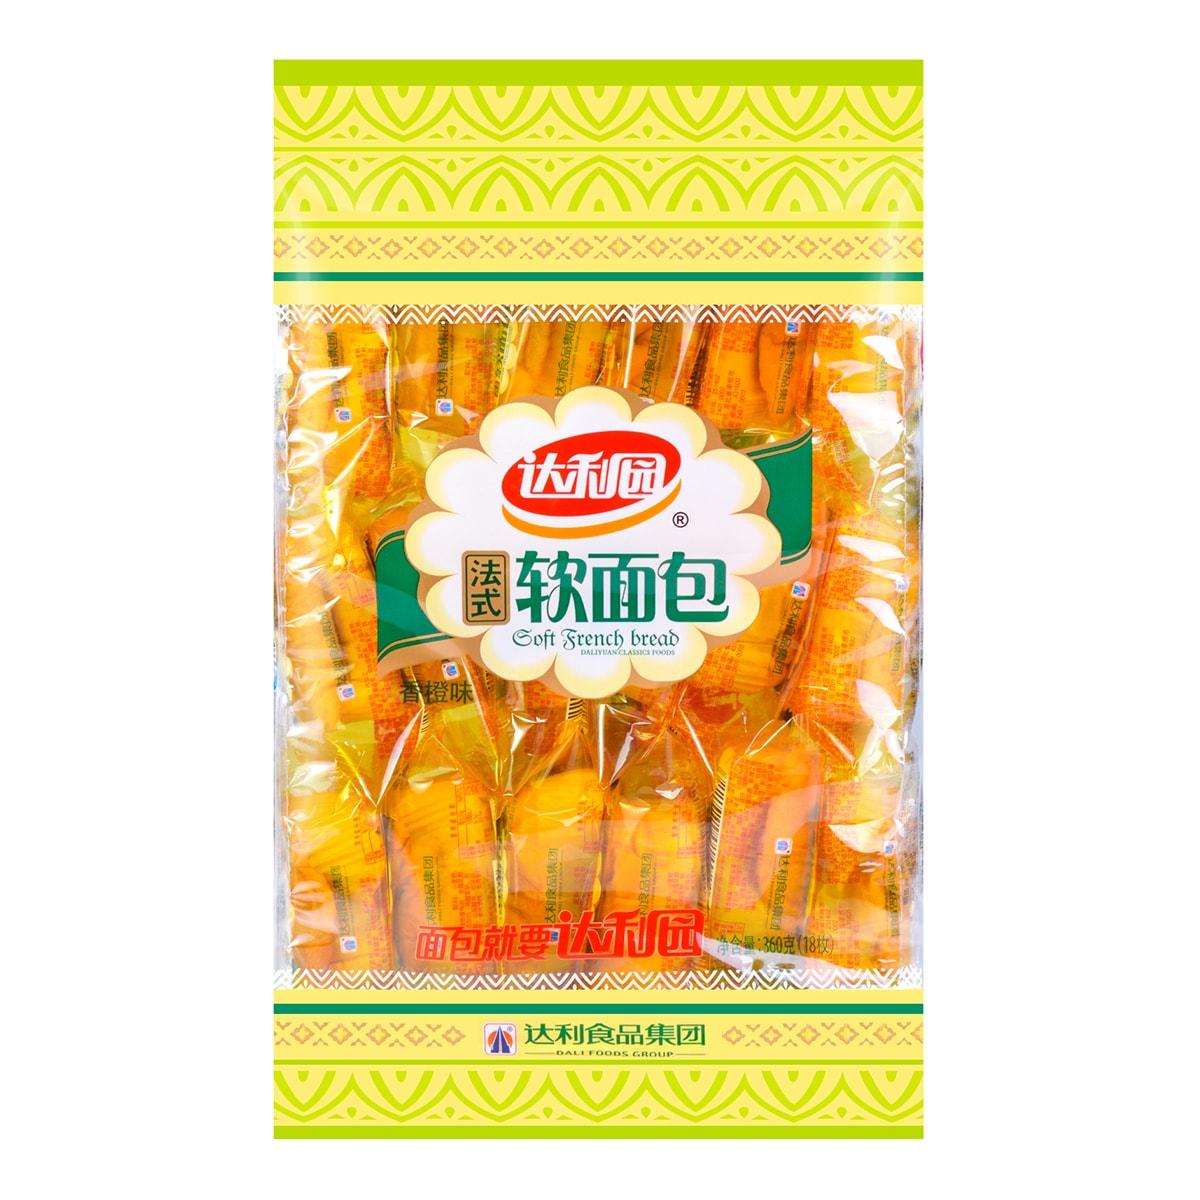 Yamibuy.com:Customer reviews:DALI Soft French Bread Orange 18 Pieces  360g